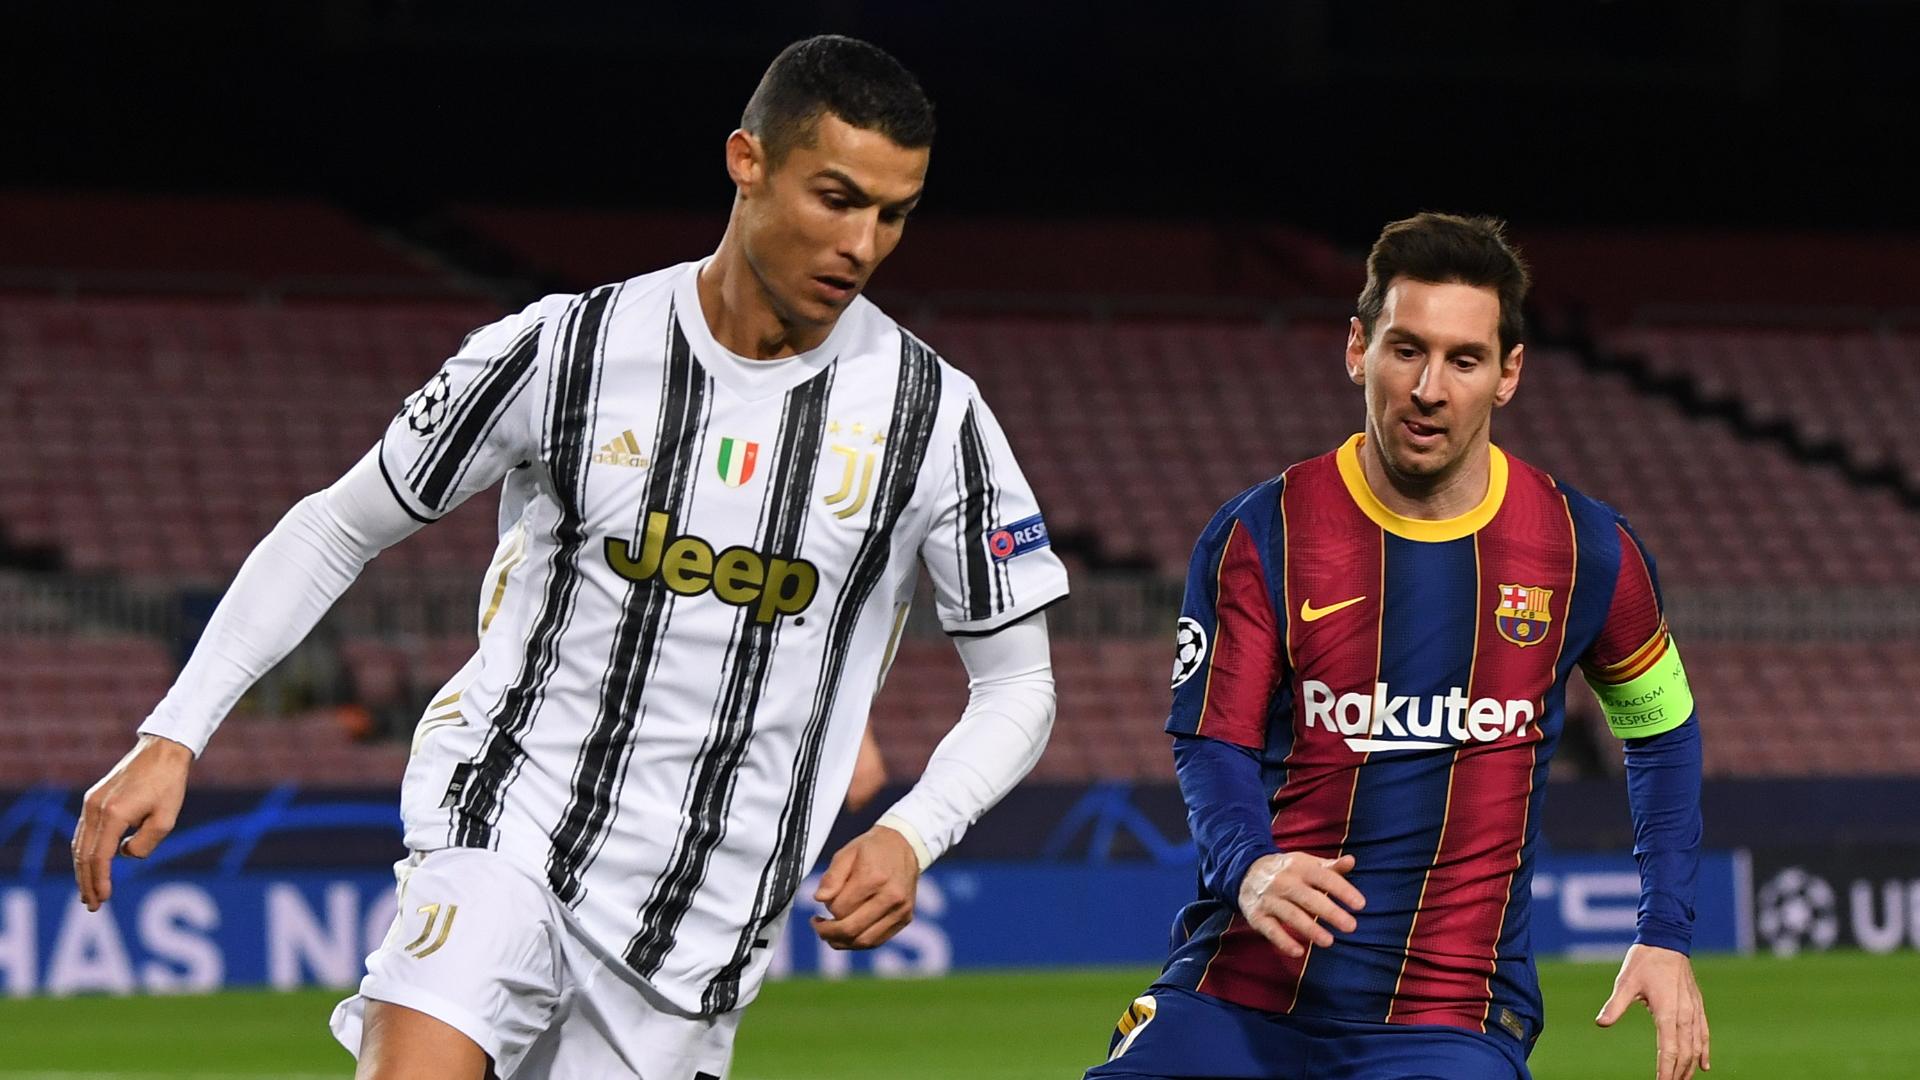 Messi's PSG move didn't impact Ronaldo's Juventus future, says Bonucci